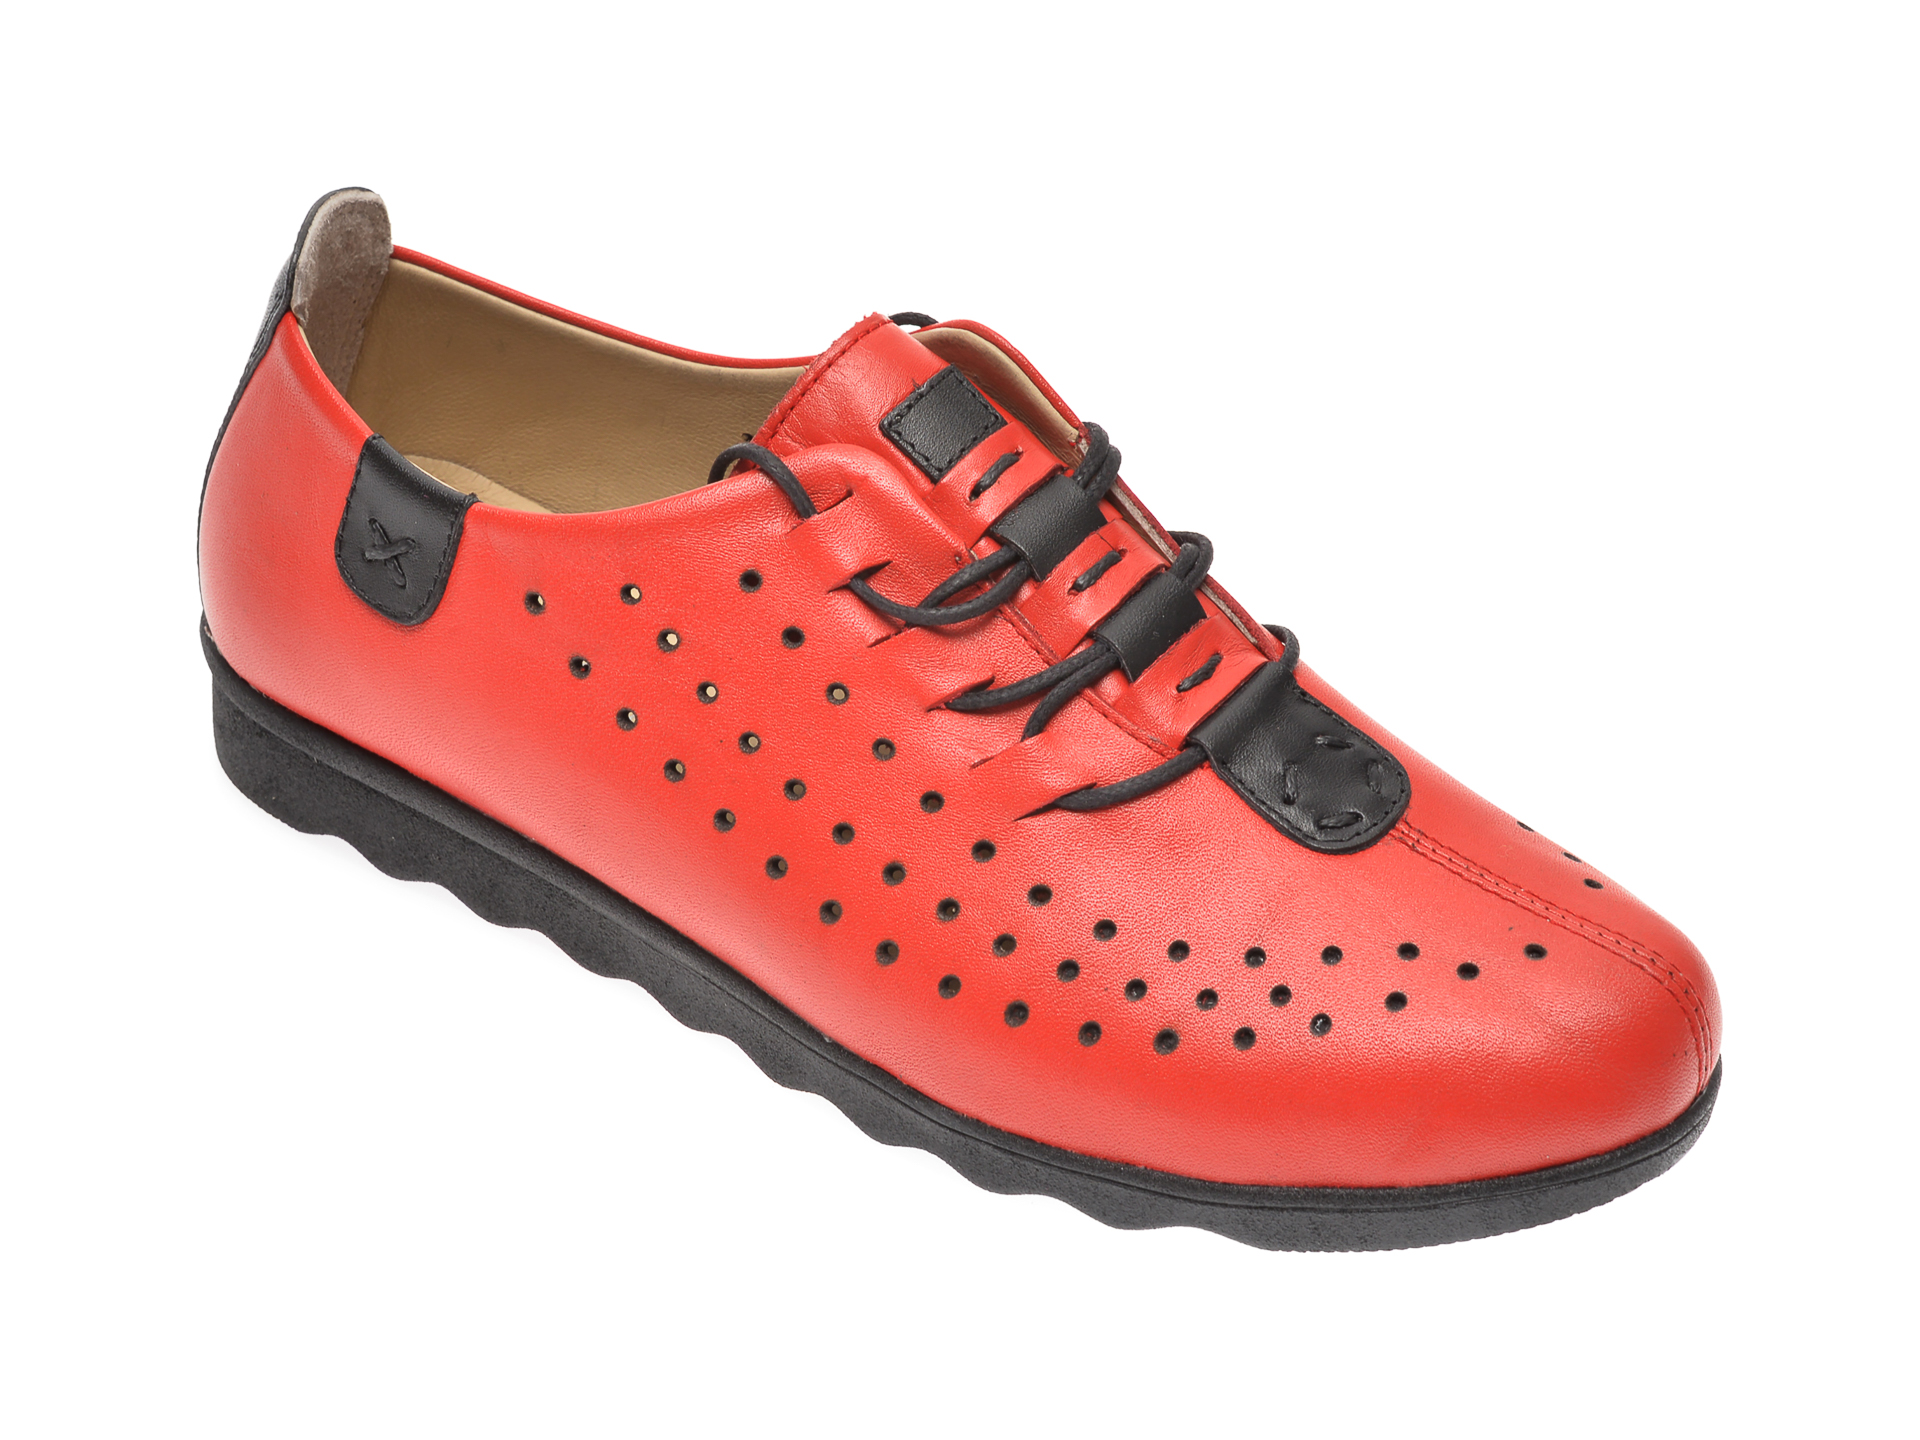 Pantofi PASS COLLECTION rosii, K92101, din piele naturala imagine